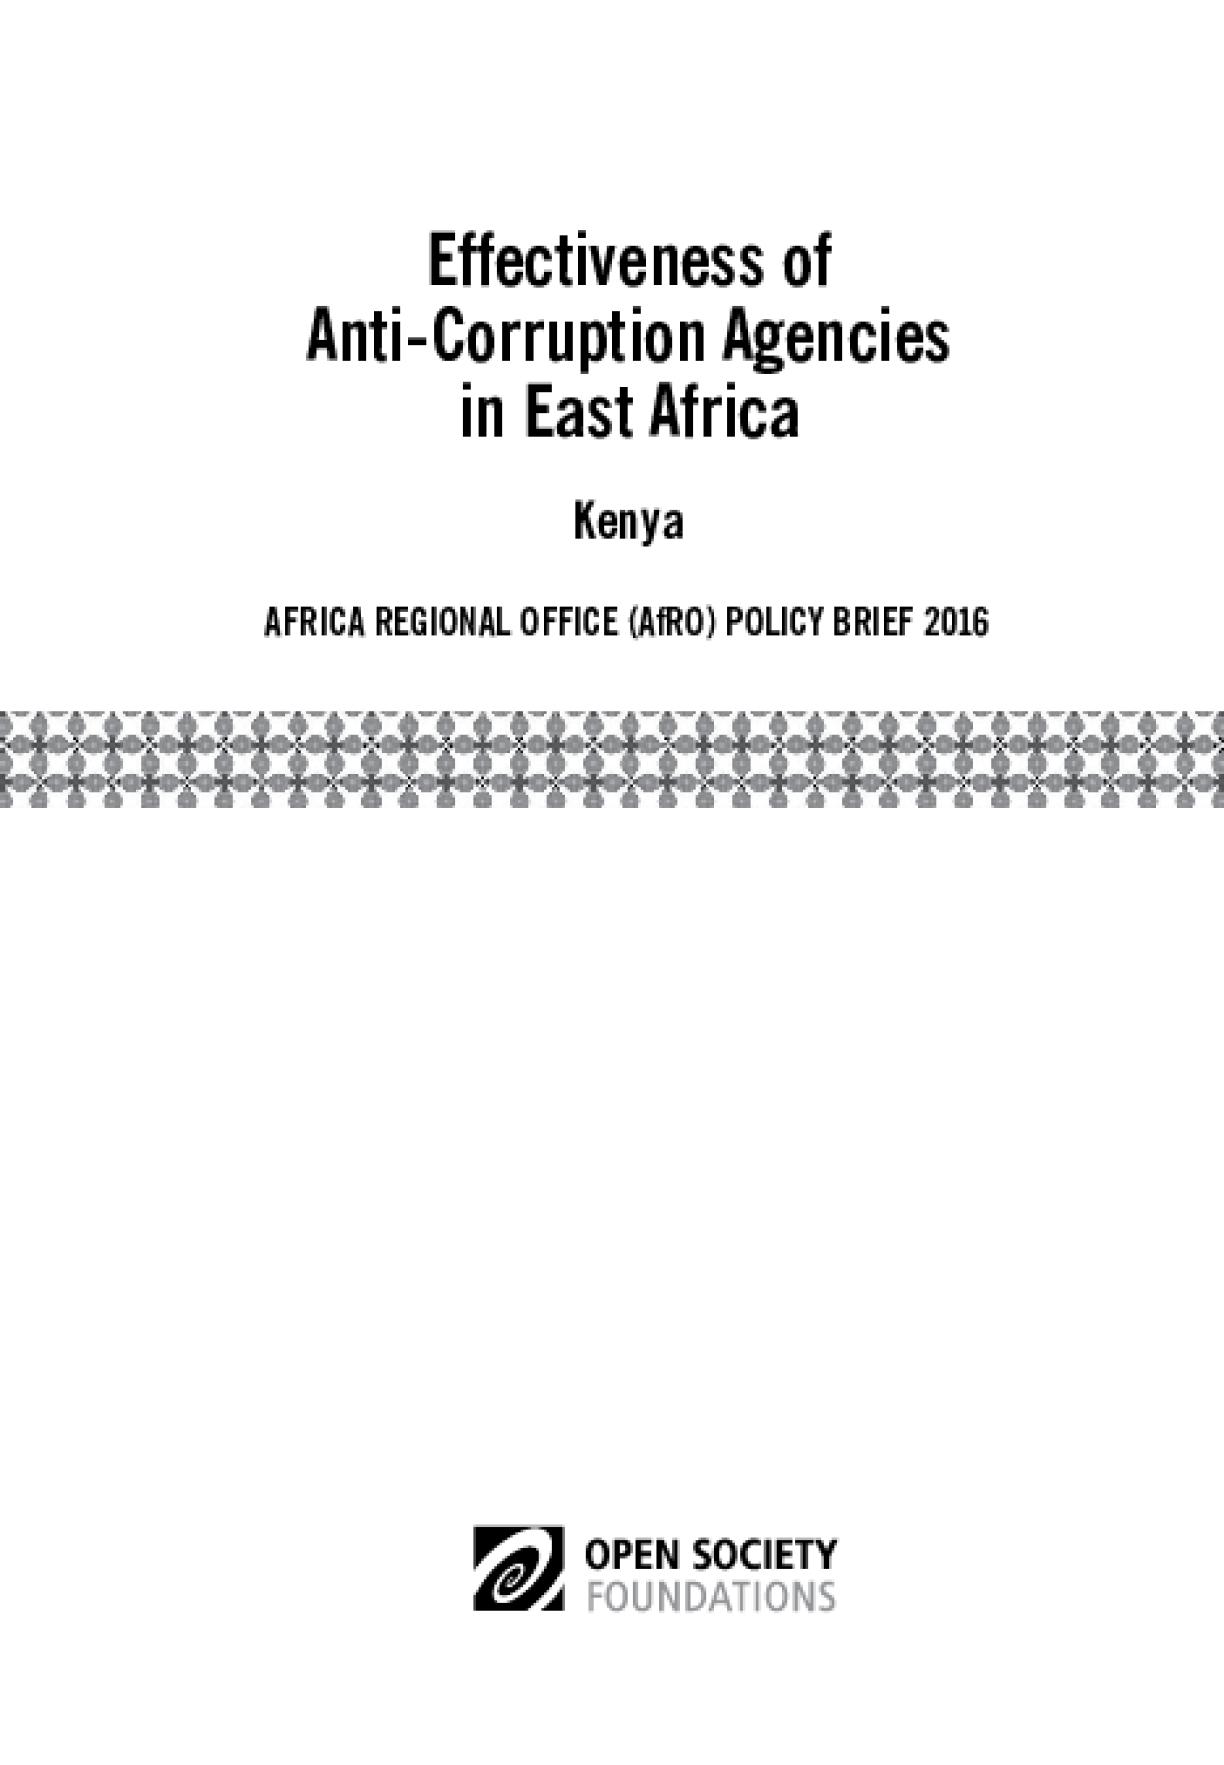 Effectiveness of Anticorruption Agencies in East Africa: Kenya